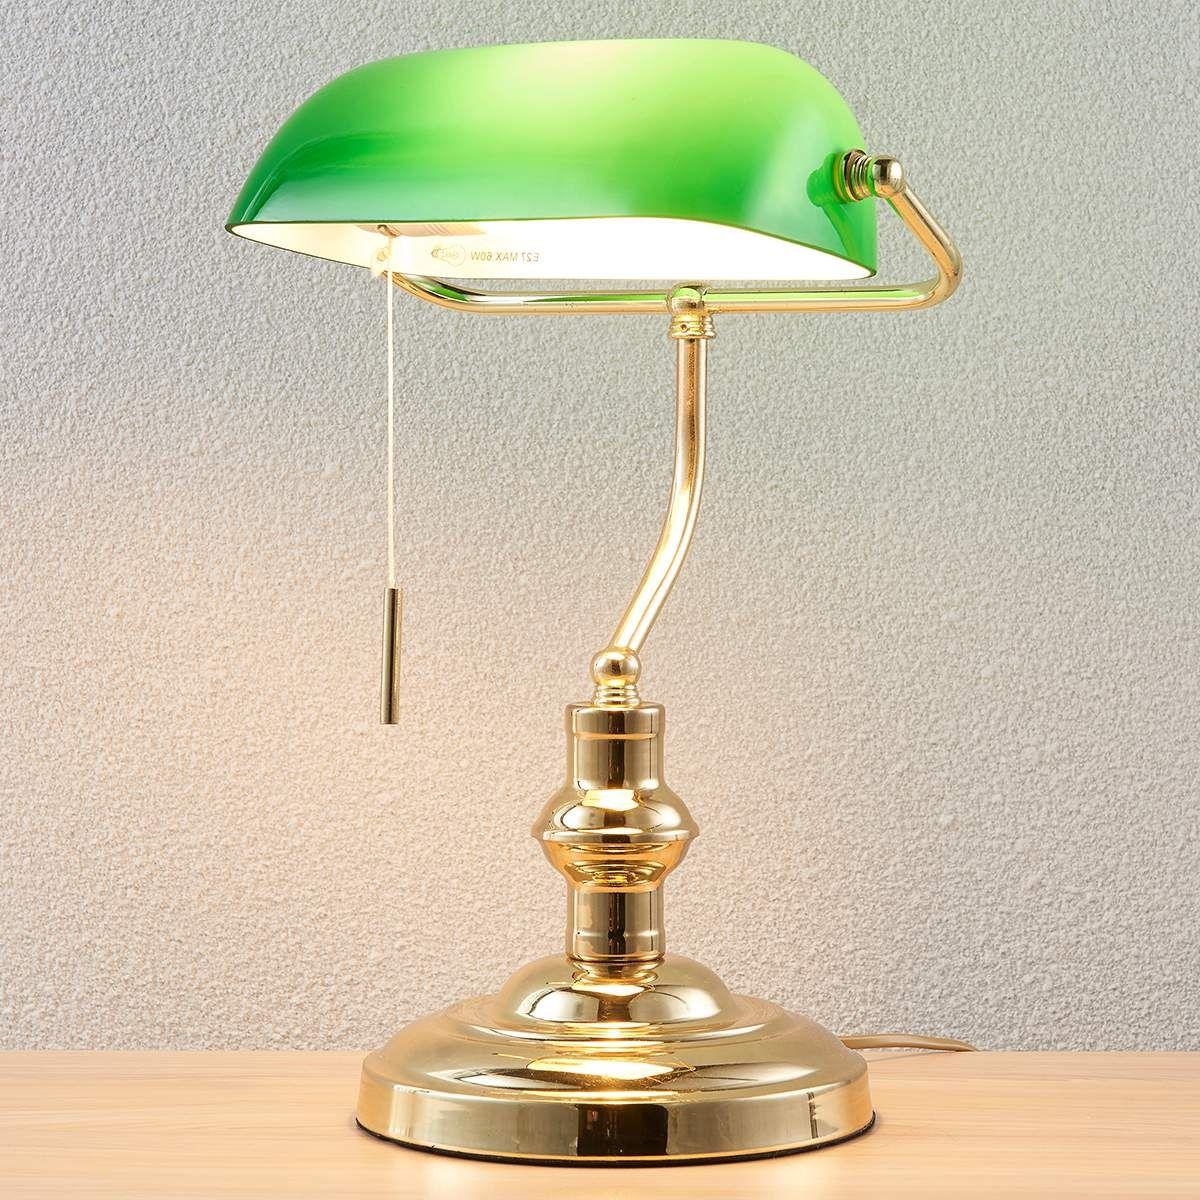 Bankerlampe Milenka Messing Poliert Schreibtischlampe Lampen